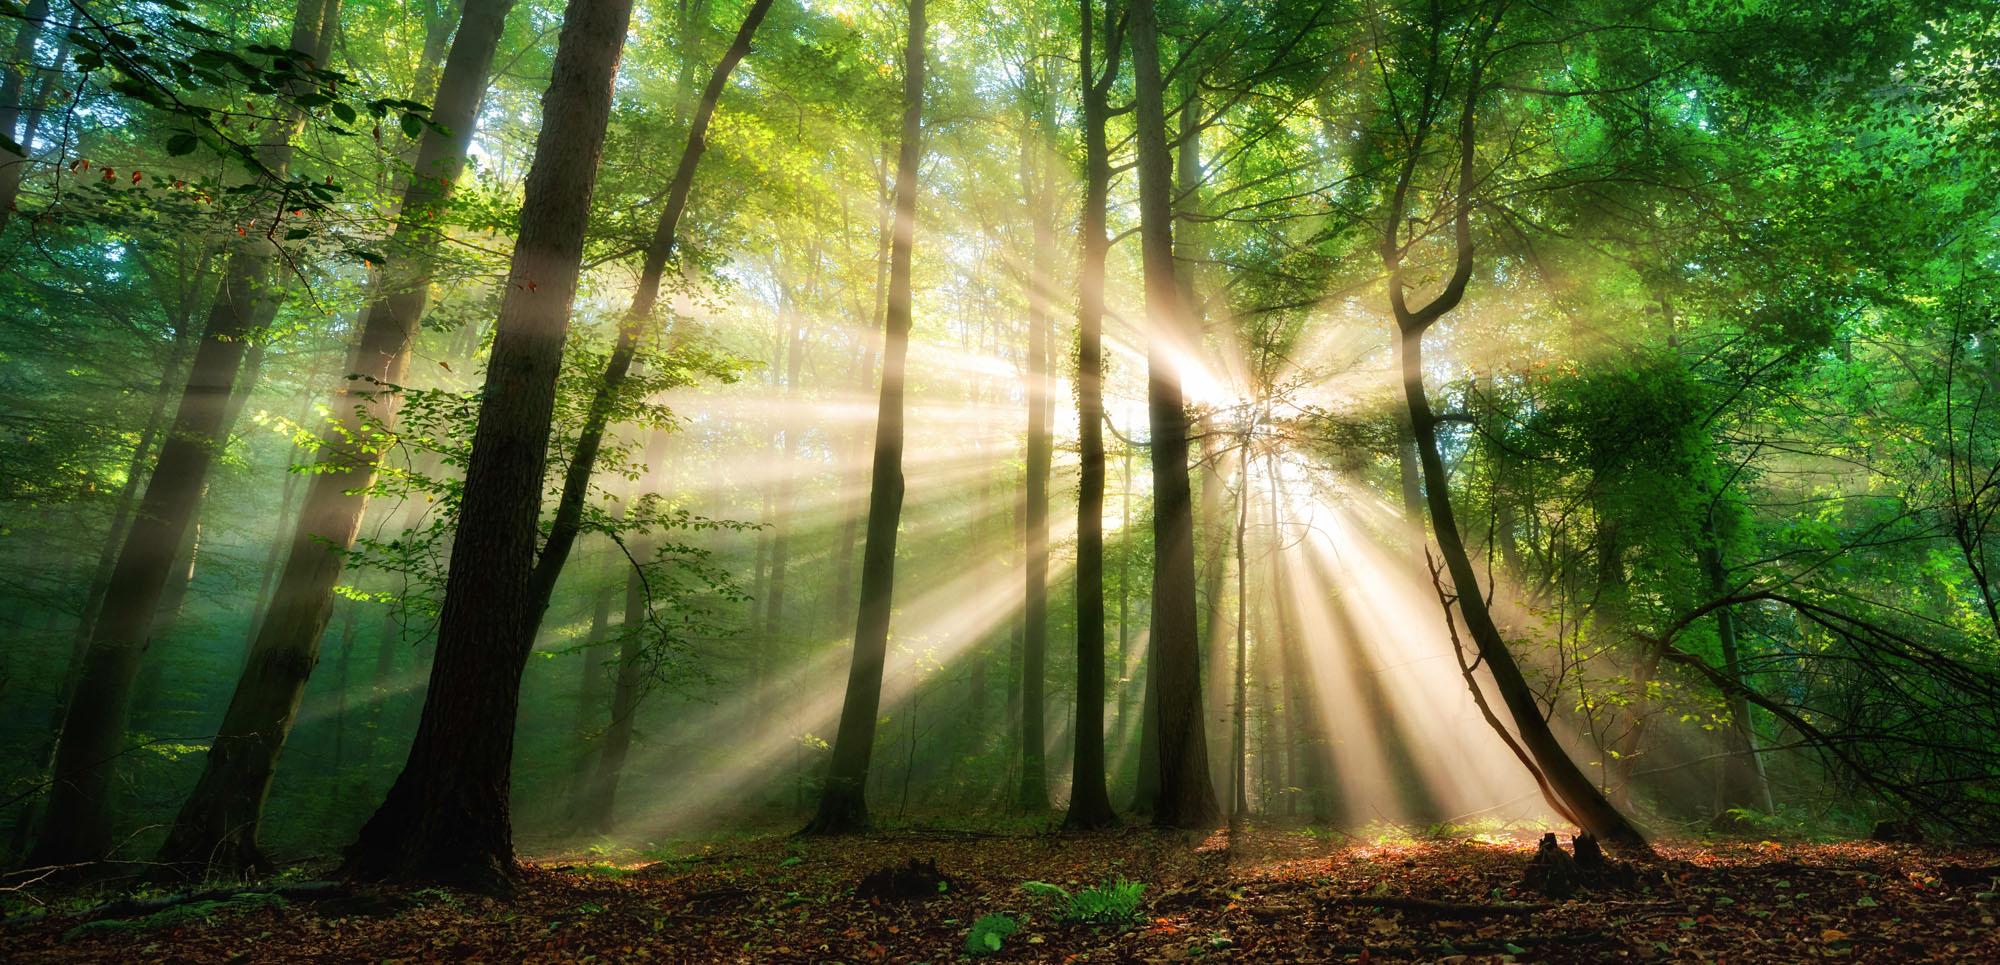 light through trees representing lunavi concept of illuminating your technology path